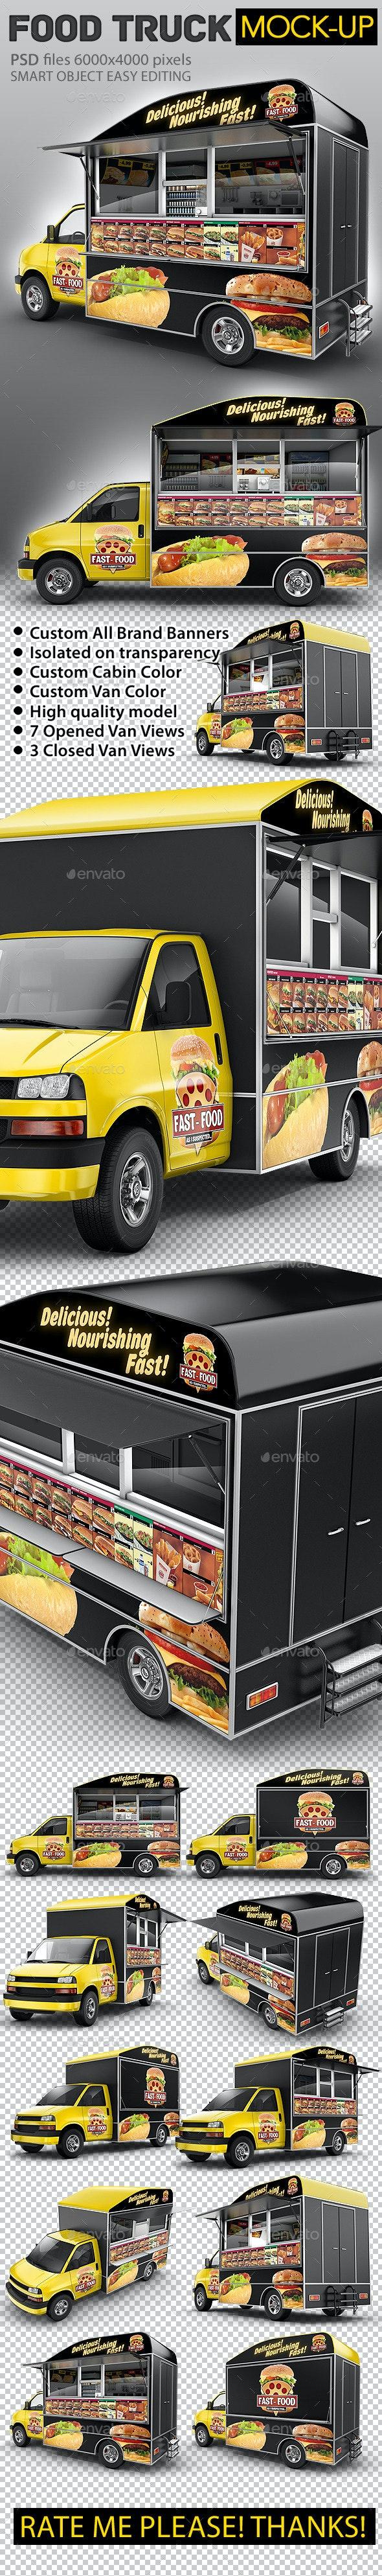 Food Truck Mock-Up. Van eatery mockup. - Vehicle Wraps Print